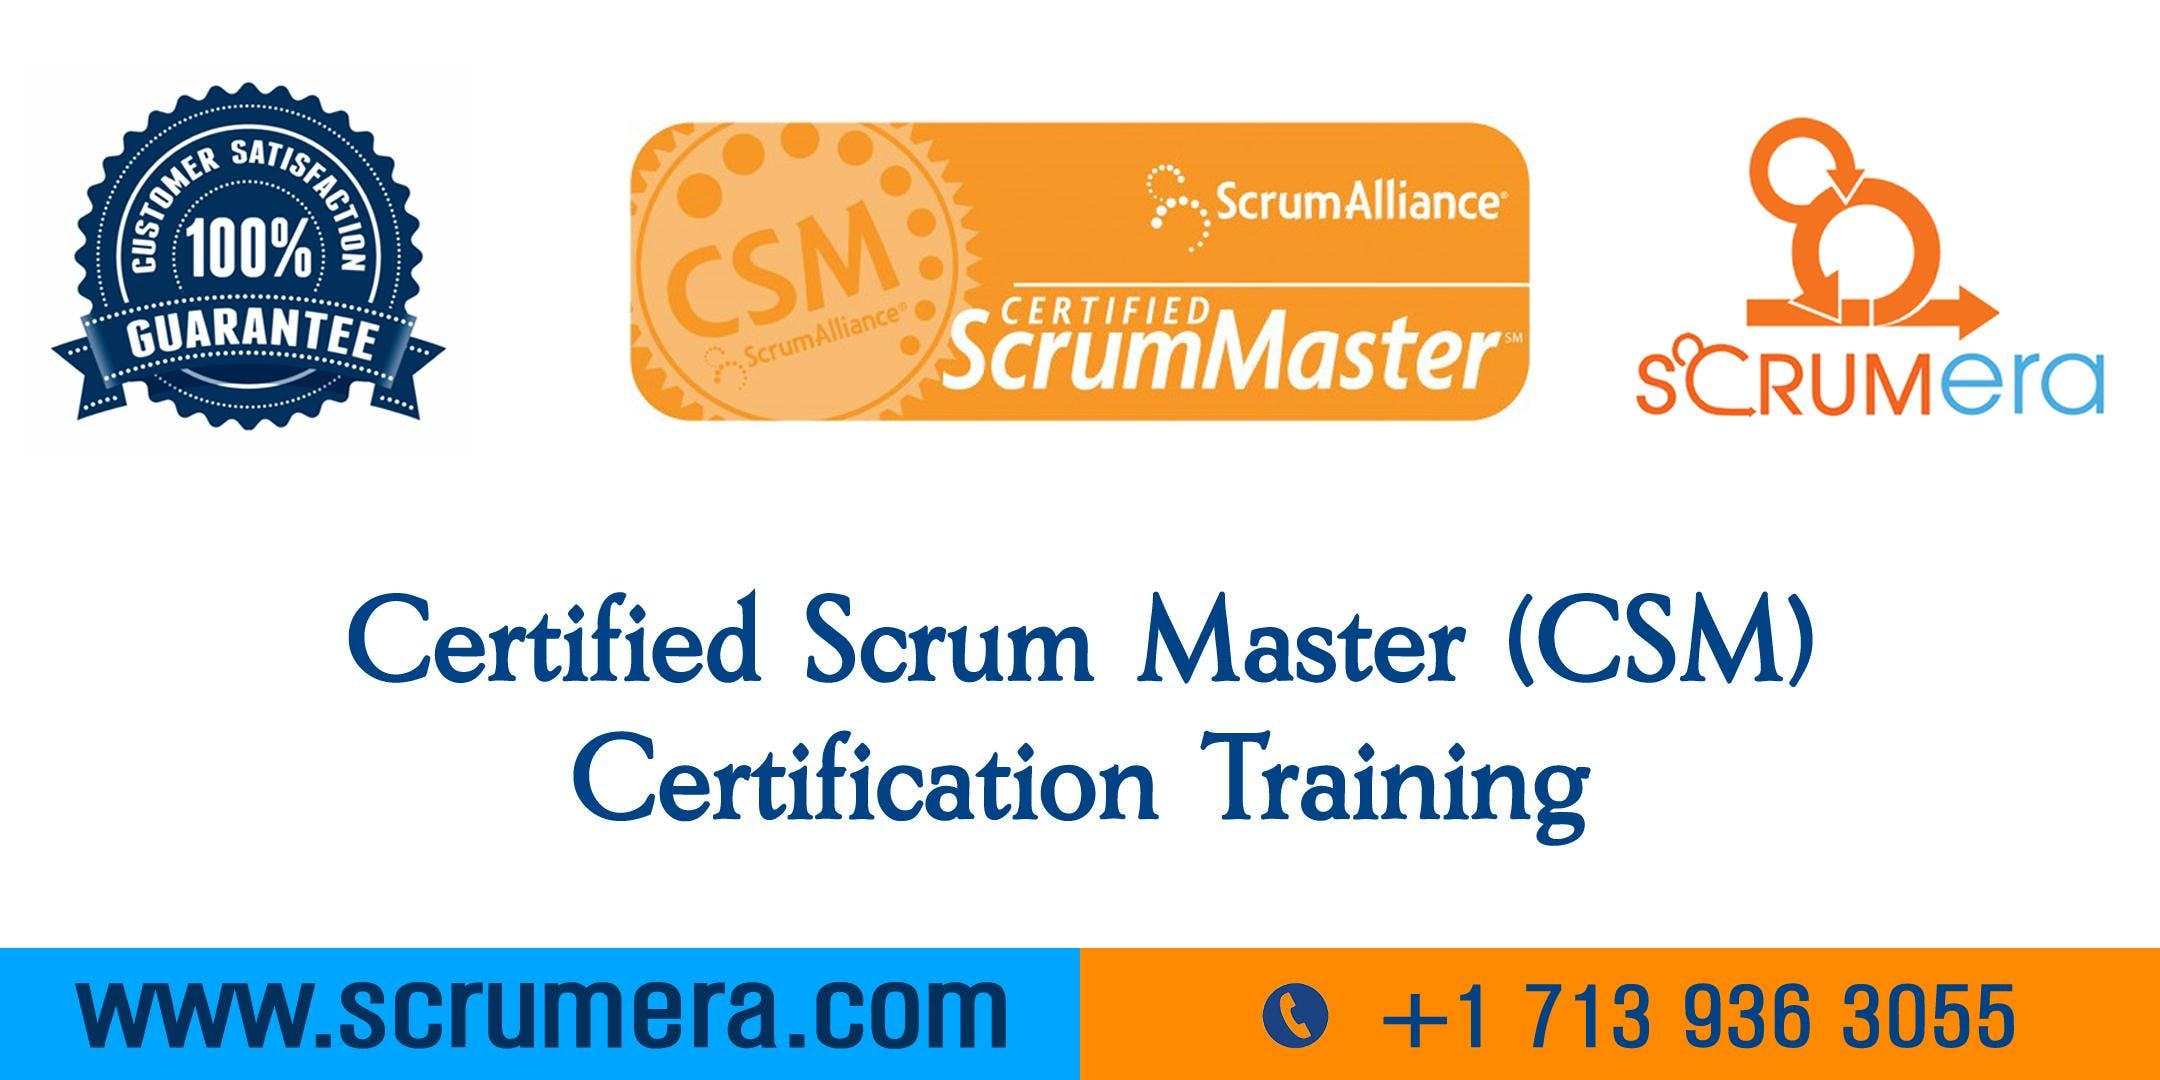 Scrum Master Certification | CSM Training | CSM Certification Workshop | Certified Scrum Master (CSM) Training in Tacoma, WA | ScrumERA